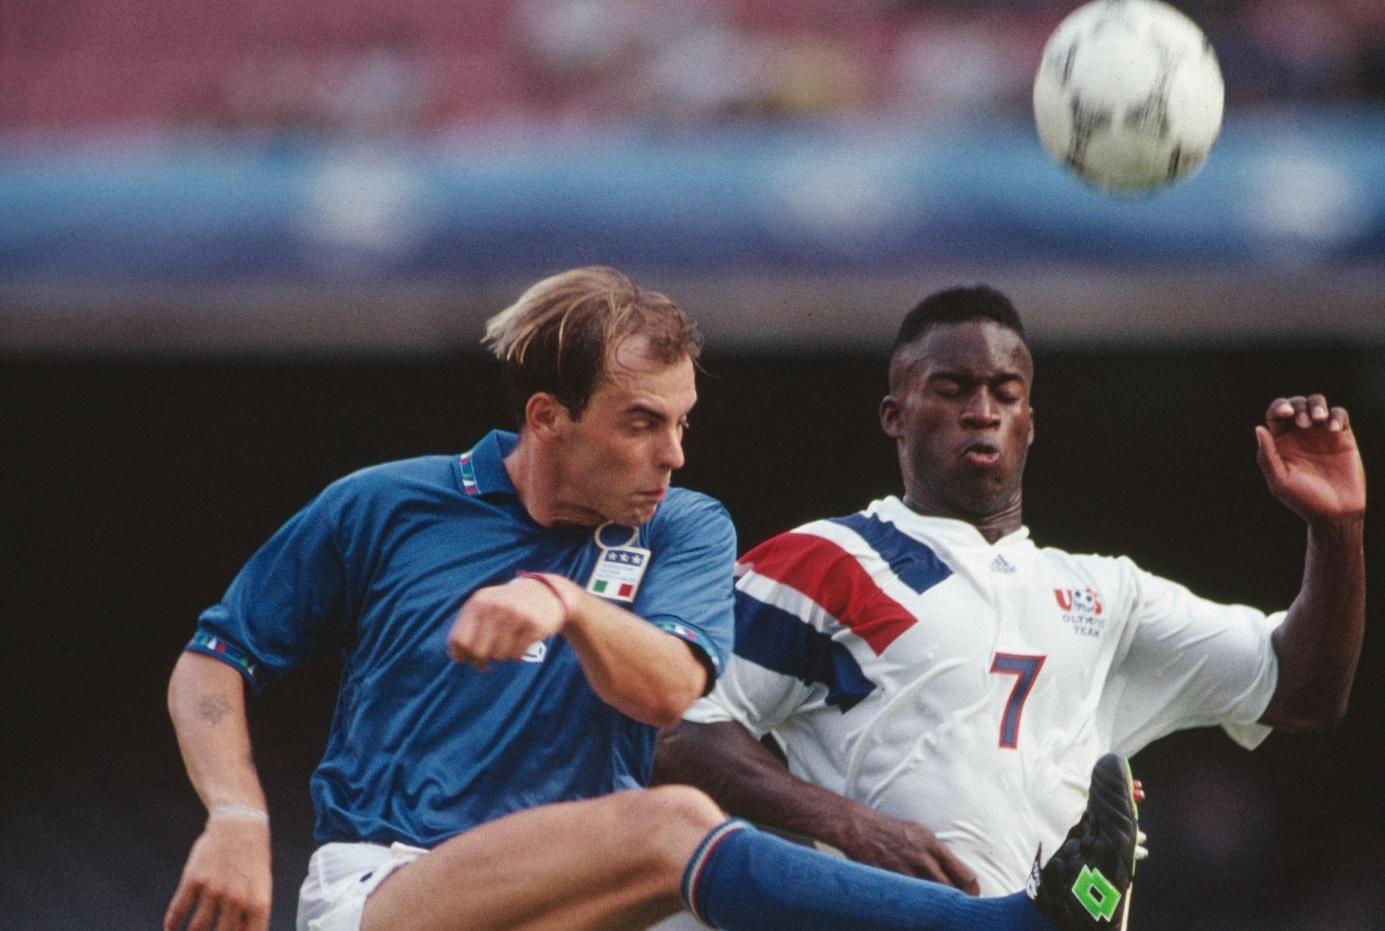 italia-usa-olimpiadi-1992